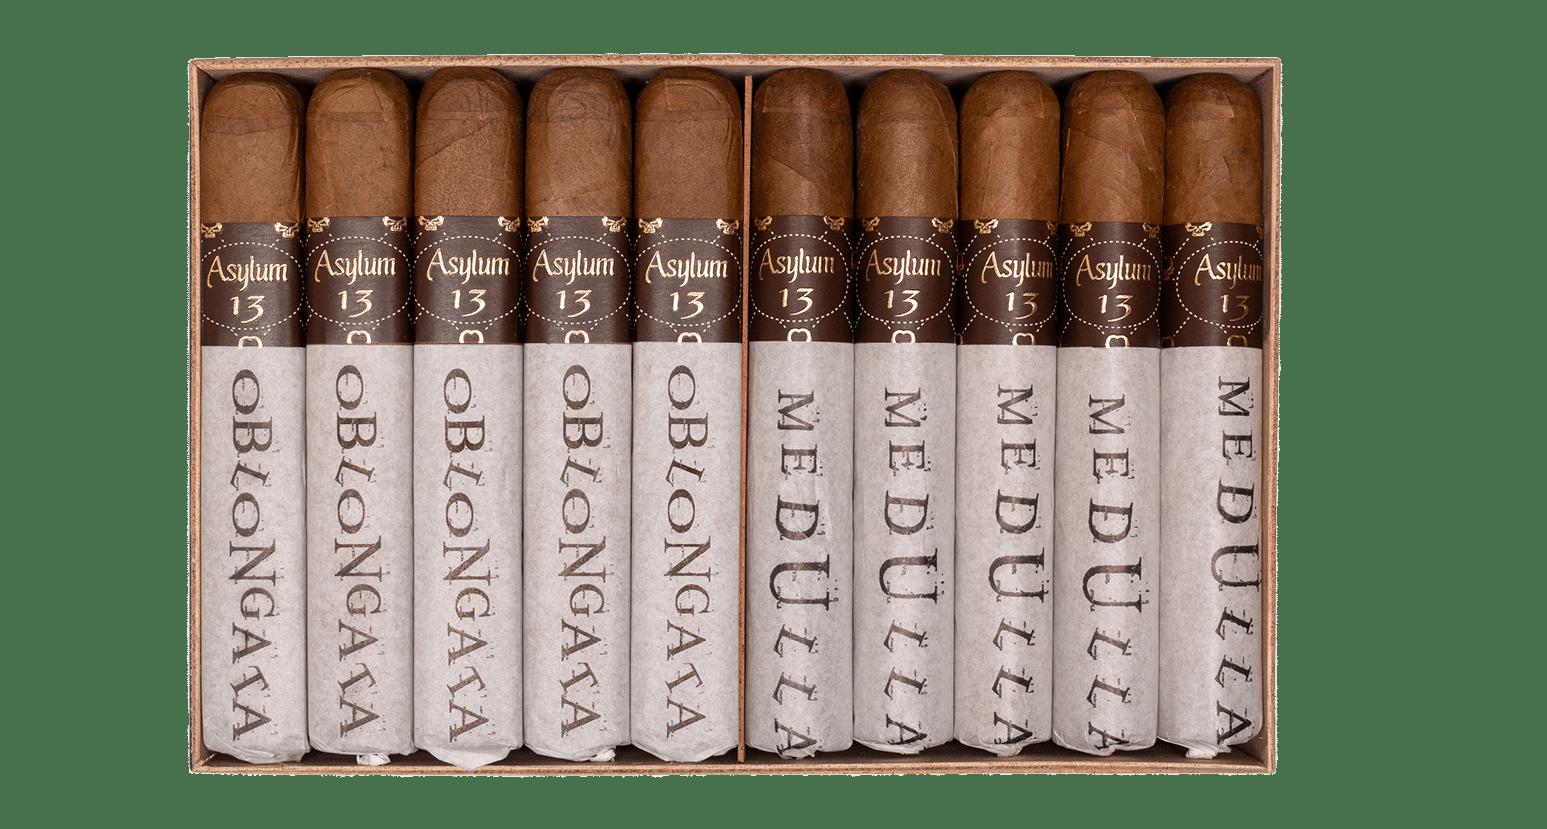 Cigar #10 - Asylum 13 Medulla Oblongata Natural